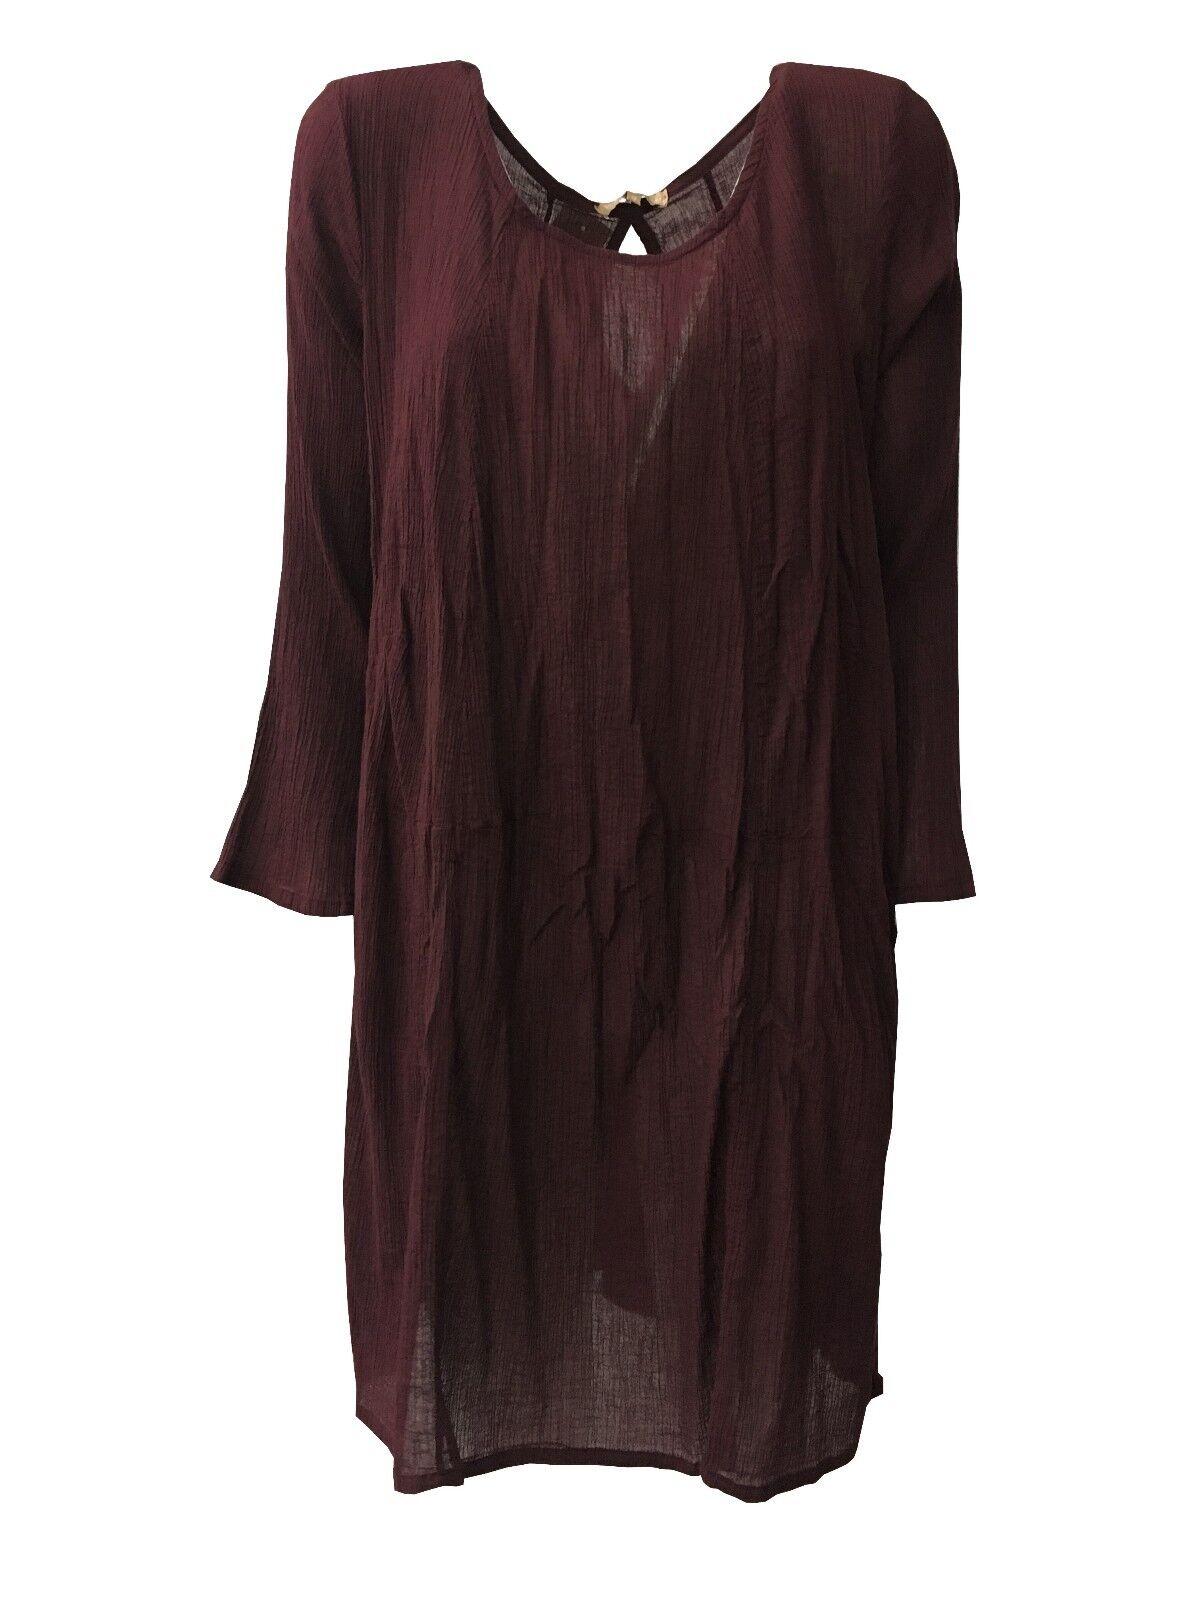 HUMILITY 1949 Kleid Frau Garza zerknittert bordeaux mit Hüfttaschen HA6073